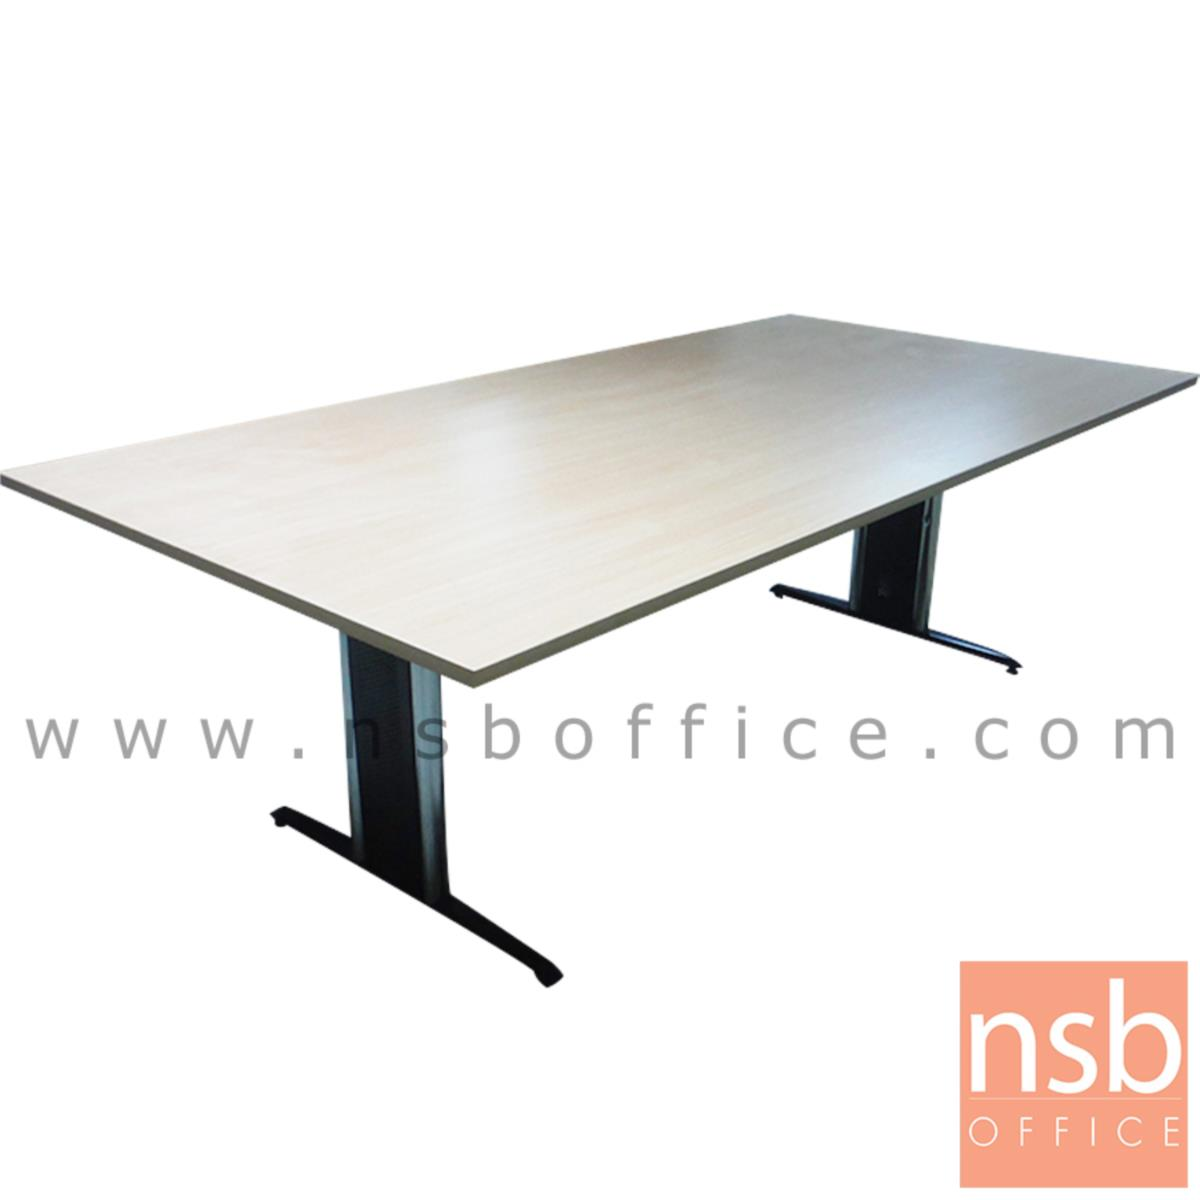 A05A007:โต๊ะประชุมทรงสี่เหลี่ยม  6 ,8 ,10 ที่นั่ง ขนาด 180W ,200W ,240W cm. ขาเหล็กตัวไอ (ราคาไม่รวมเก้าอี้)